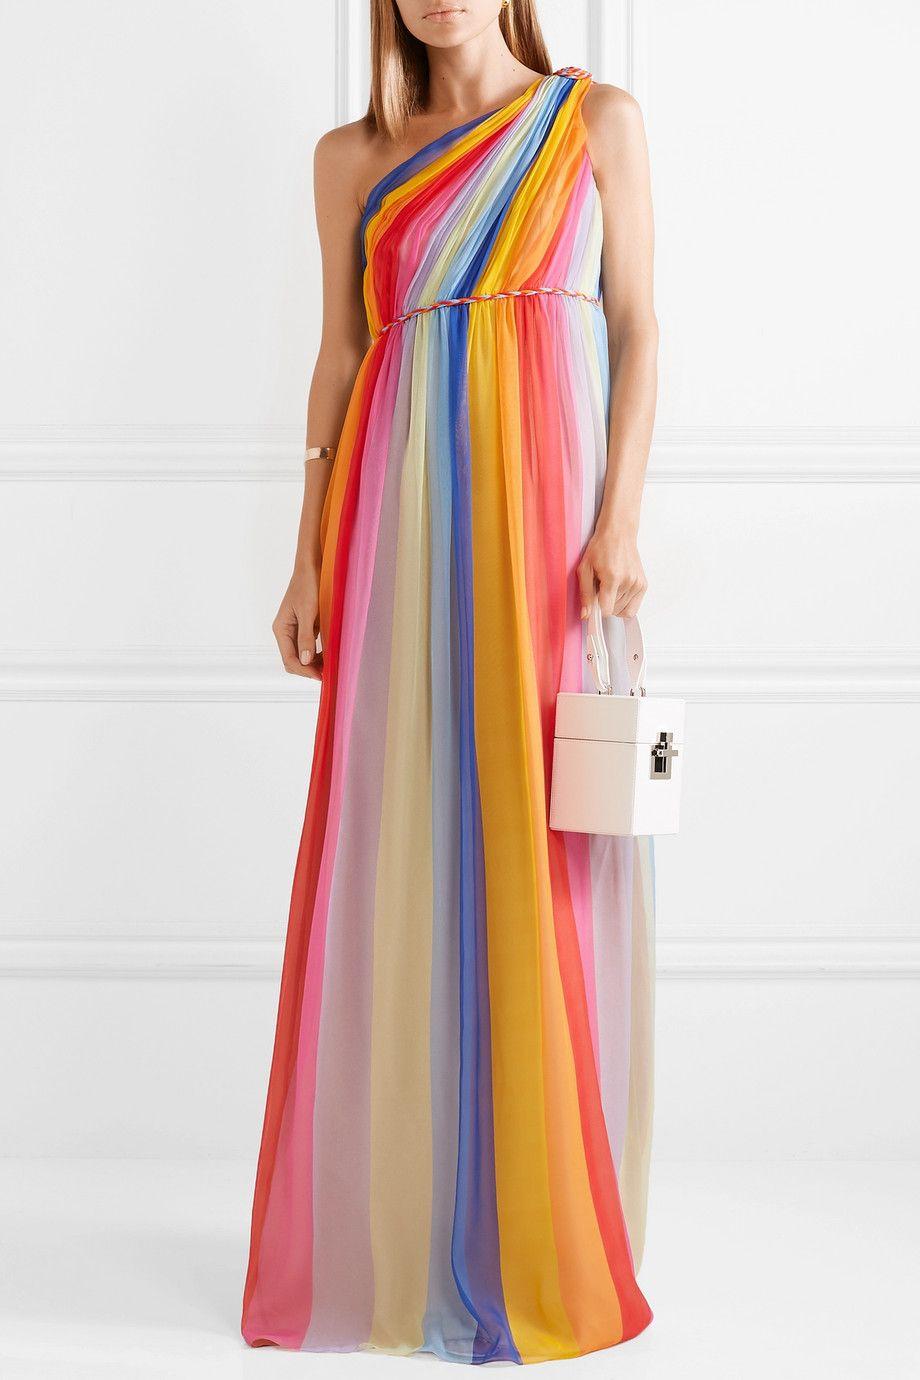 35aa8c3b8a Carolina Herrera | One-shoulder striped pleated silk-tulle gown |  NET-A-PORTER.COM